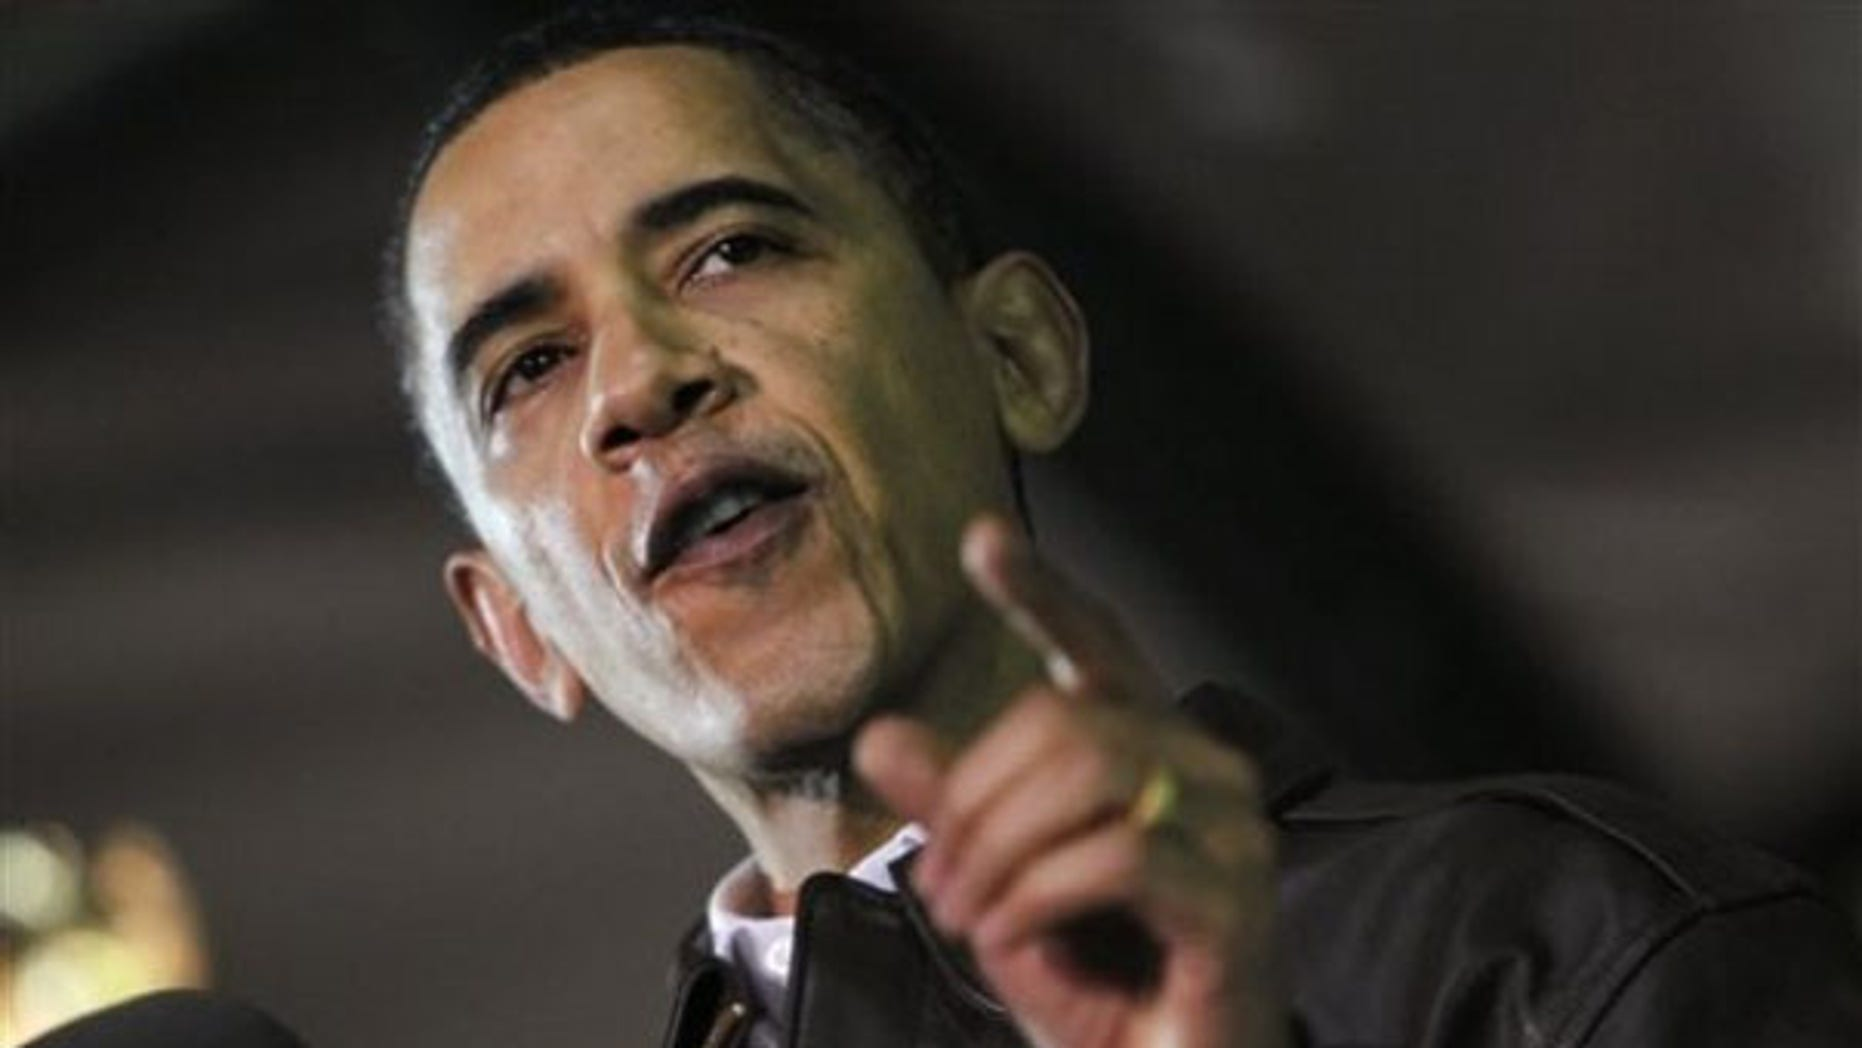 President Obama rallies troops at Bagram Air Base in Afghanistan March 28. (AP Photo)